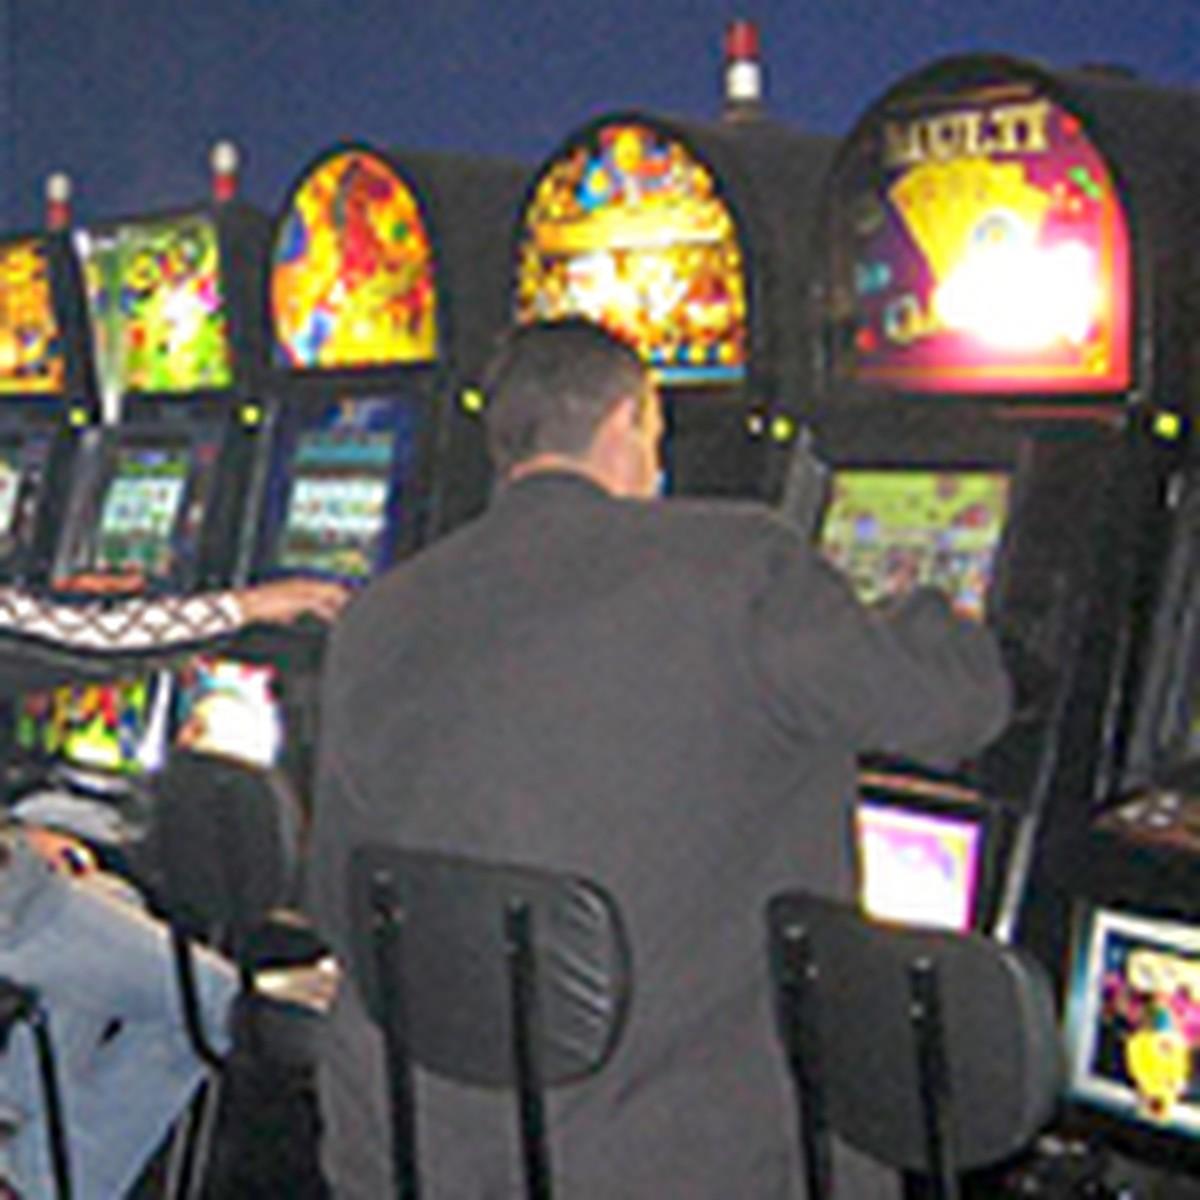 Kp.ru игровые автоматы игровые автоматы оставить комментарий inurl comment reply